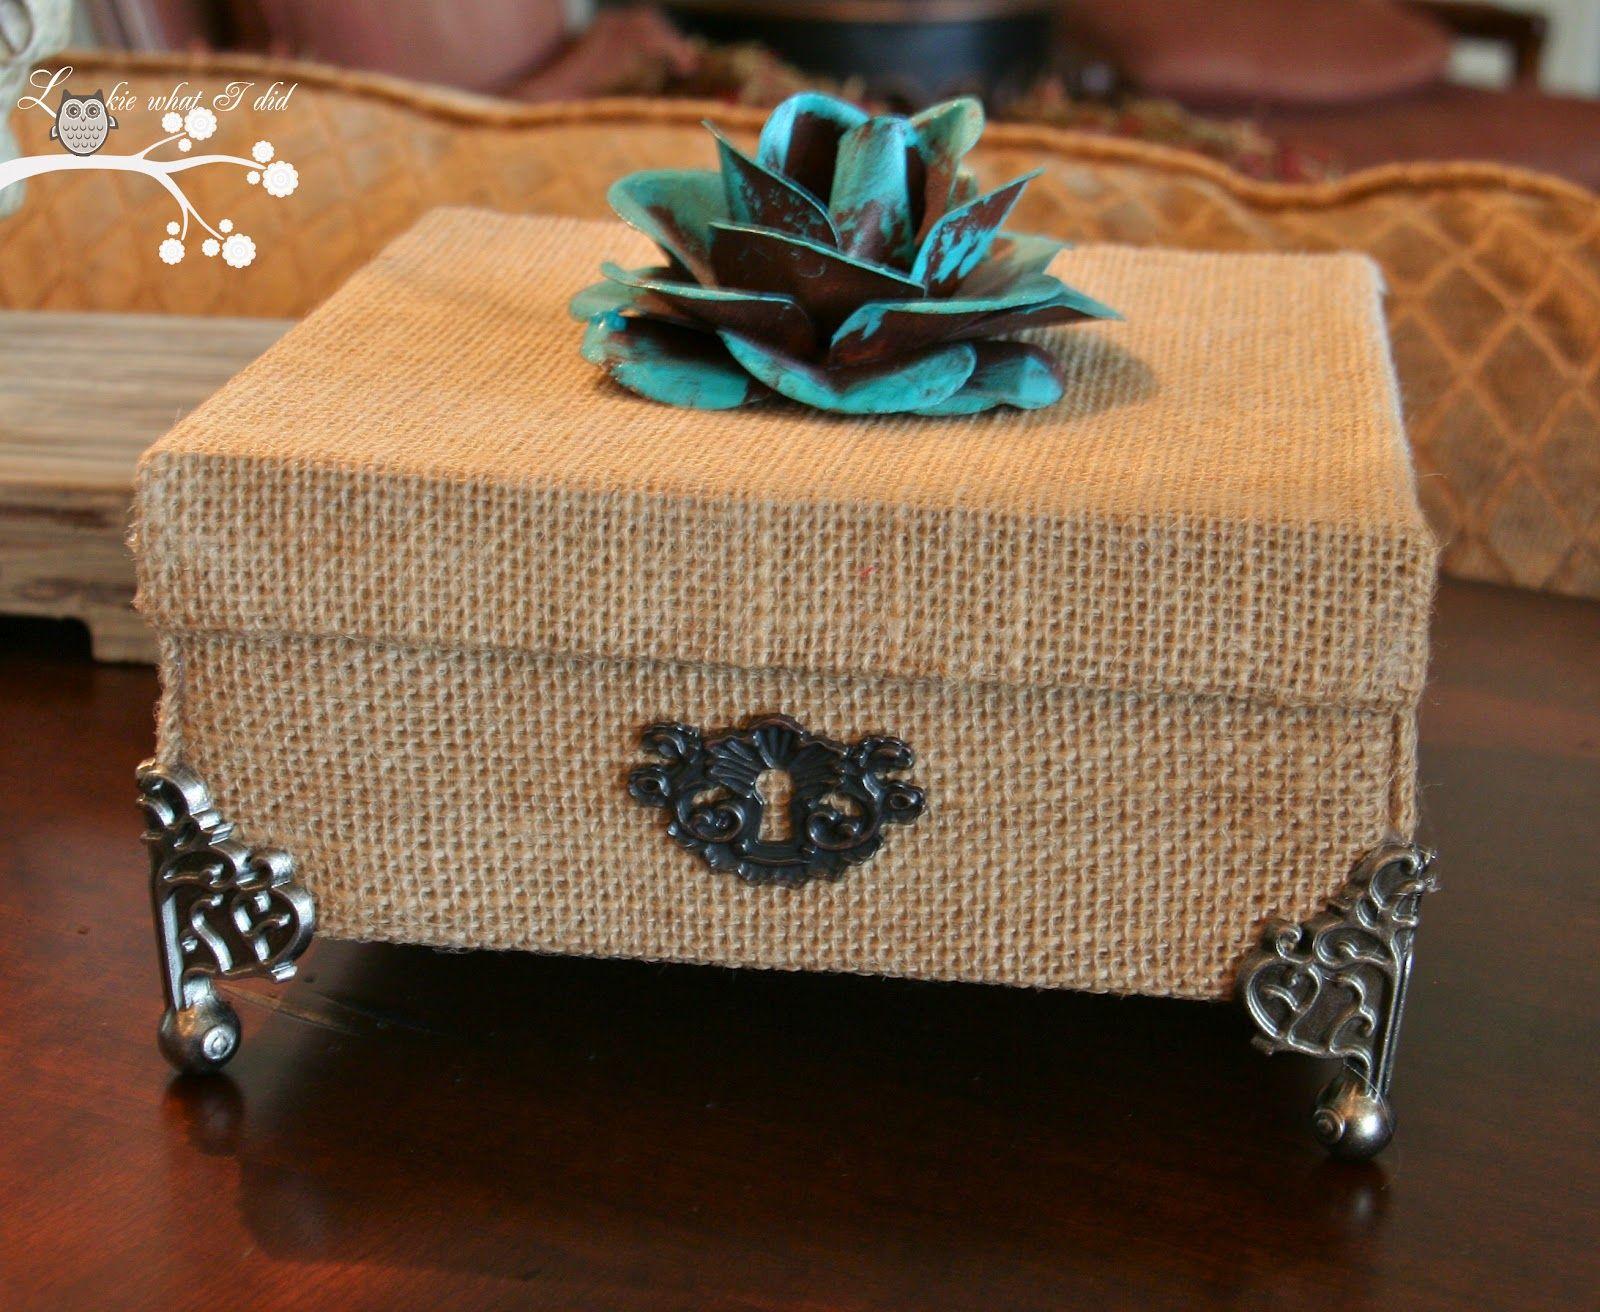 Toile de jute*m@*Burlap Cardboard Box Transformation with Burlap {Tutorial}